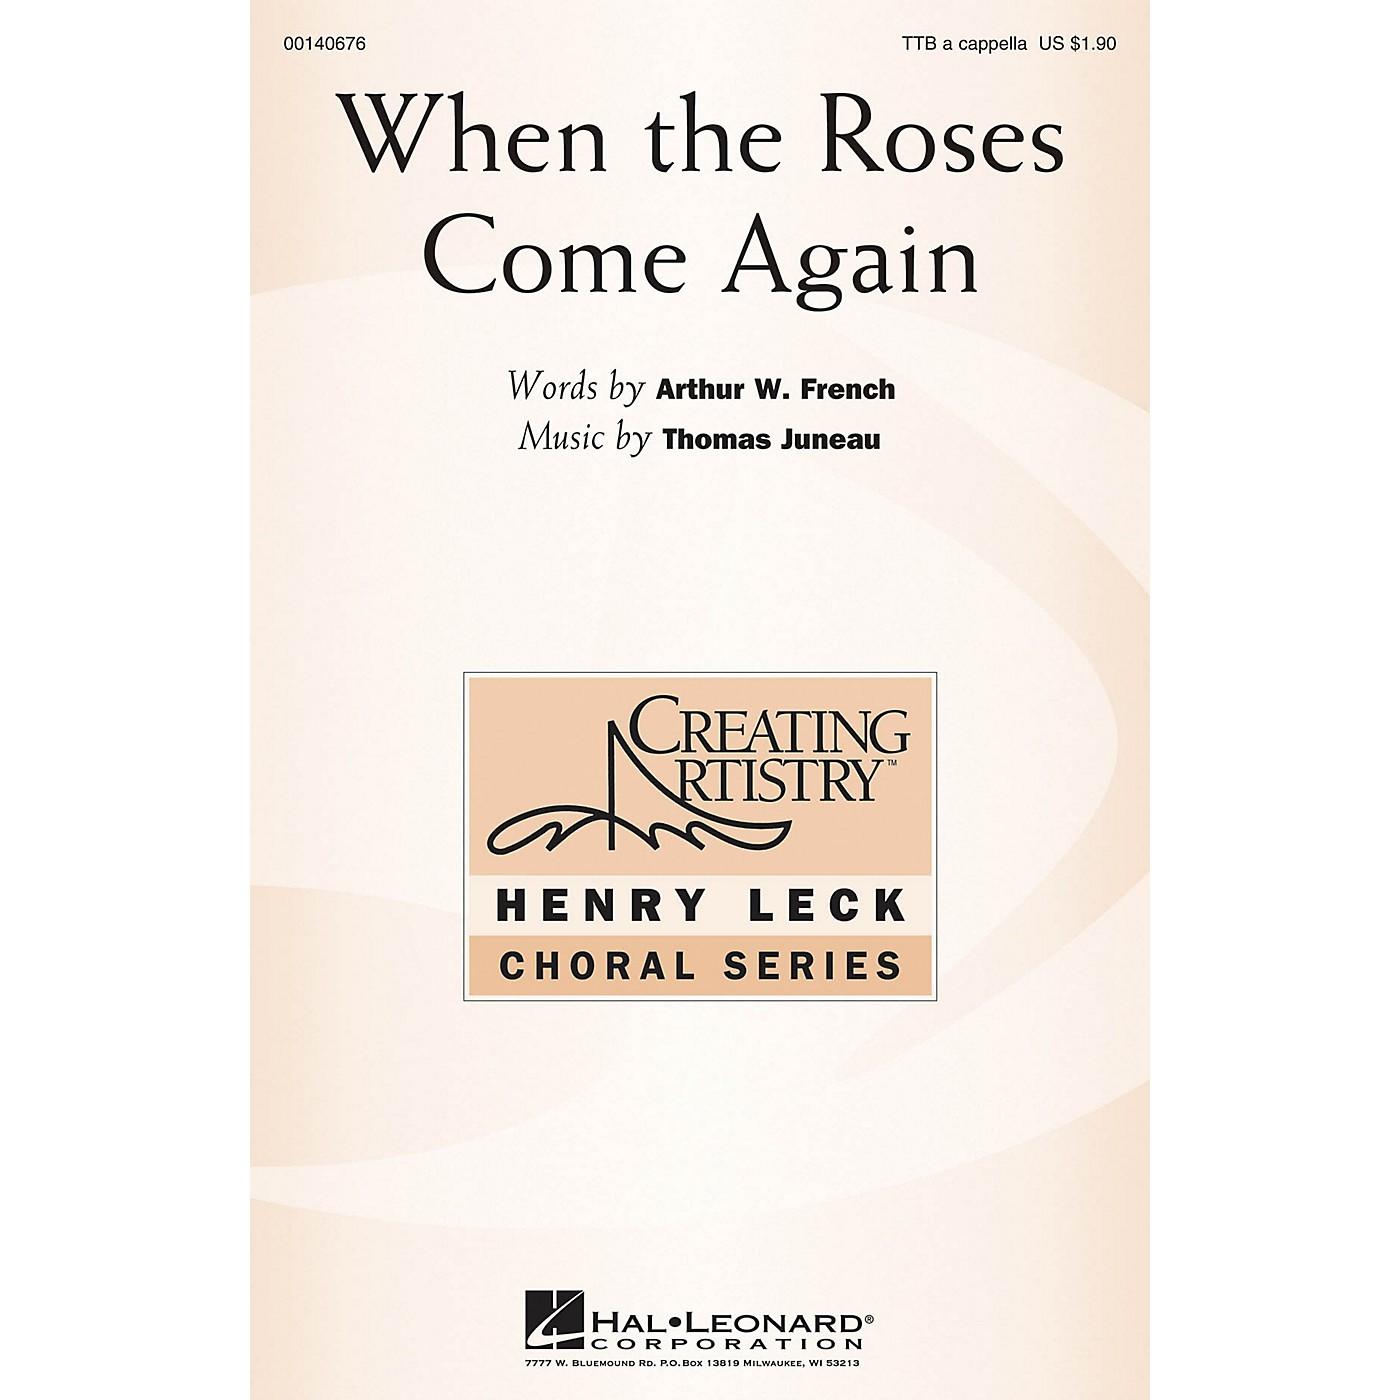 Hal Leonard When the Roses Come Again TTB composed by Thomas Juneau thumbnail